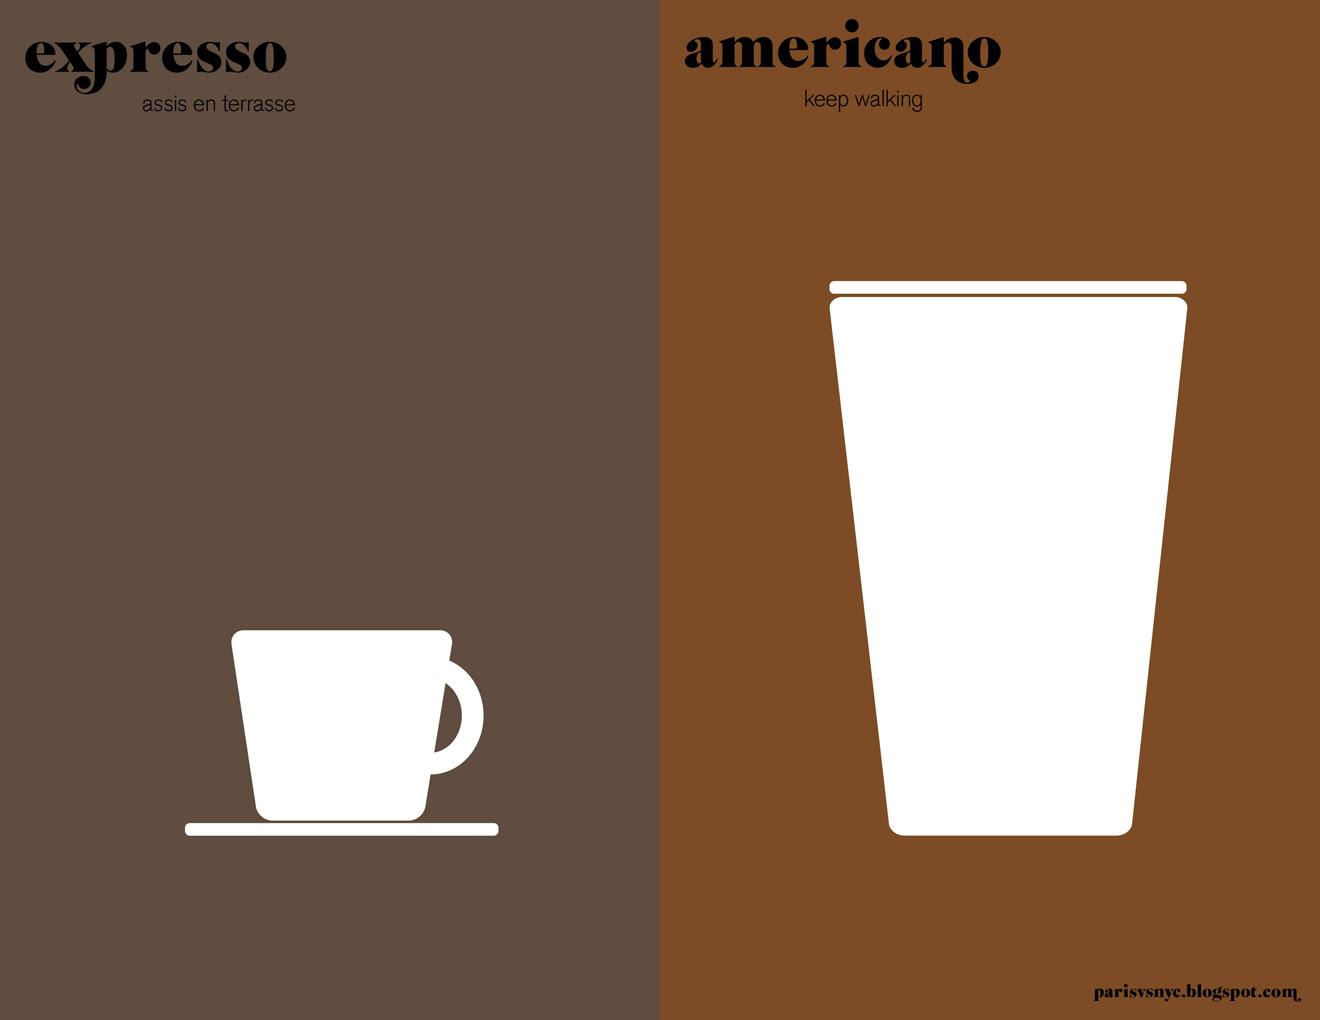 http://4.bp.blogspot.com/_Rg3hRYvJESY/TMkIIxAkrDI/AAAAAAAABpw/Qp1kLtahmxQ/s1600/01coffee.jpg